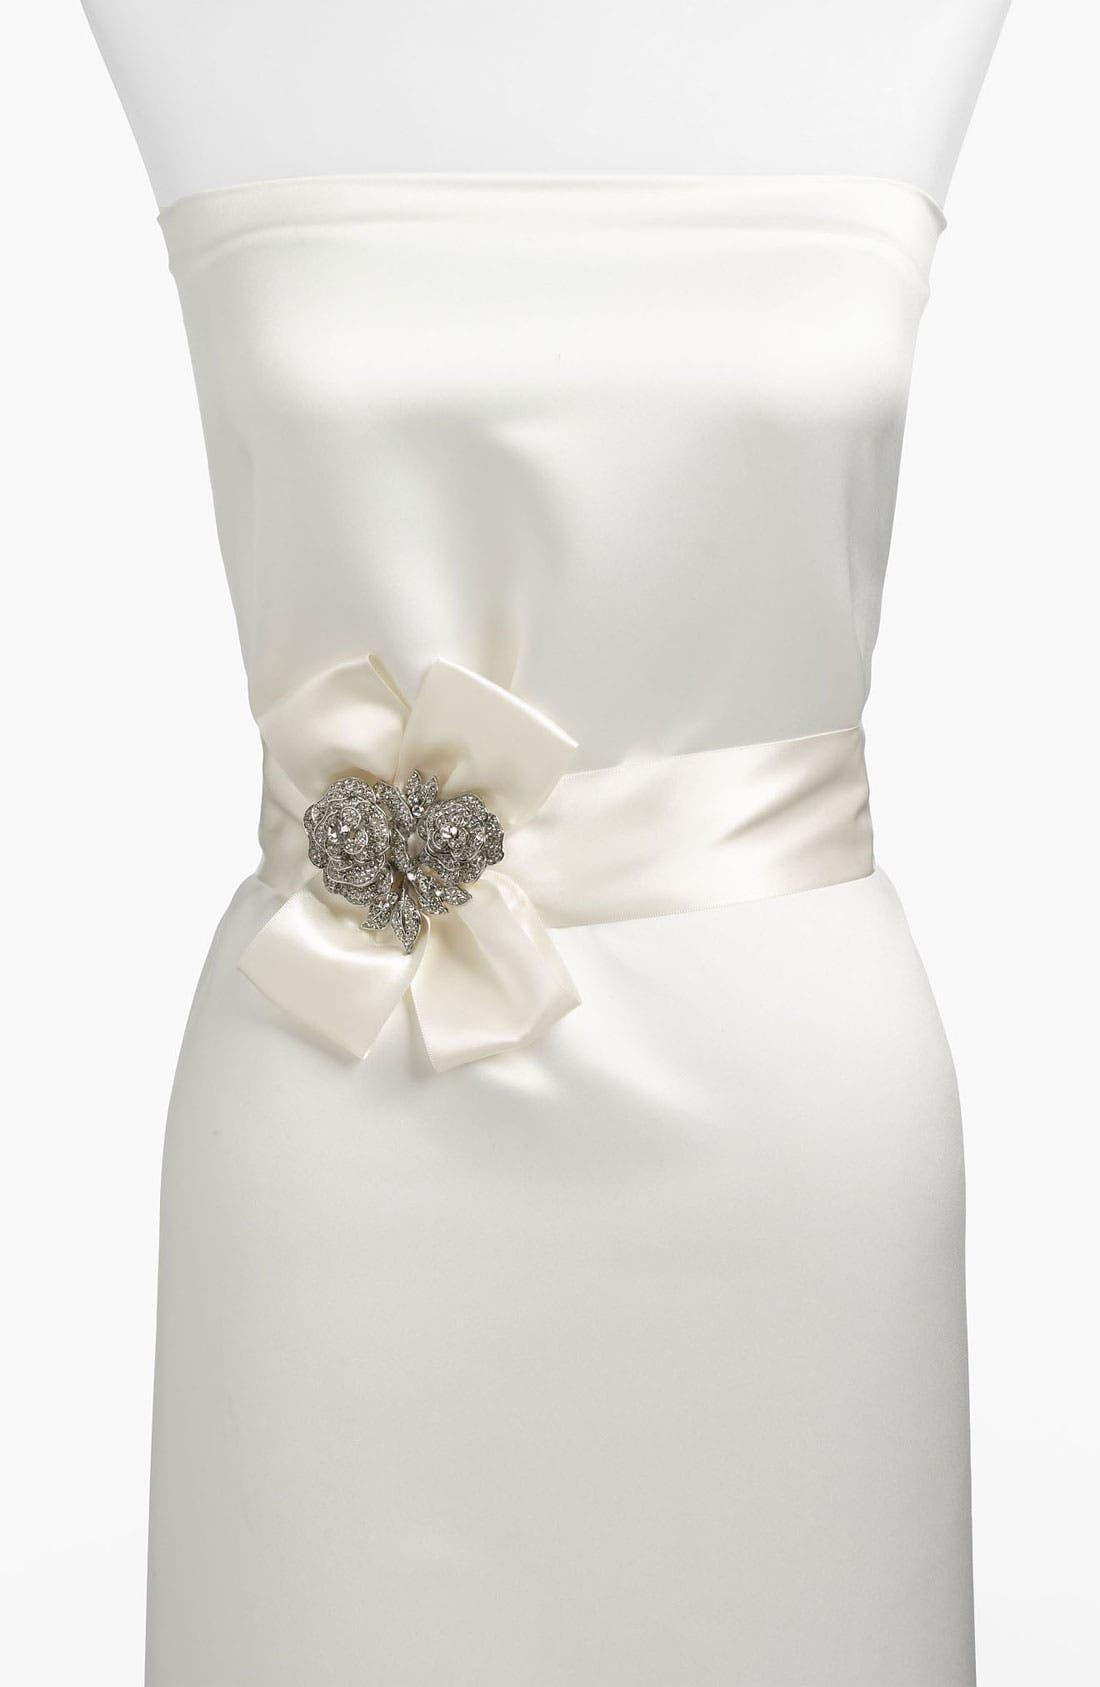 Main Image - Nina Satin Crystal Flower Sash